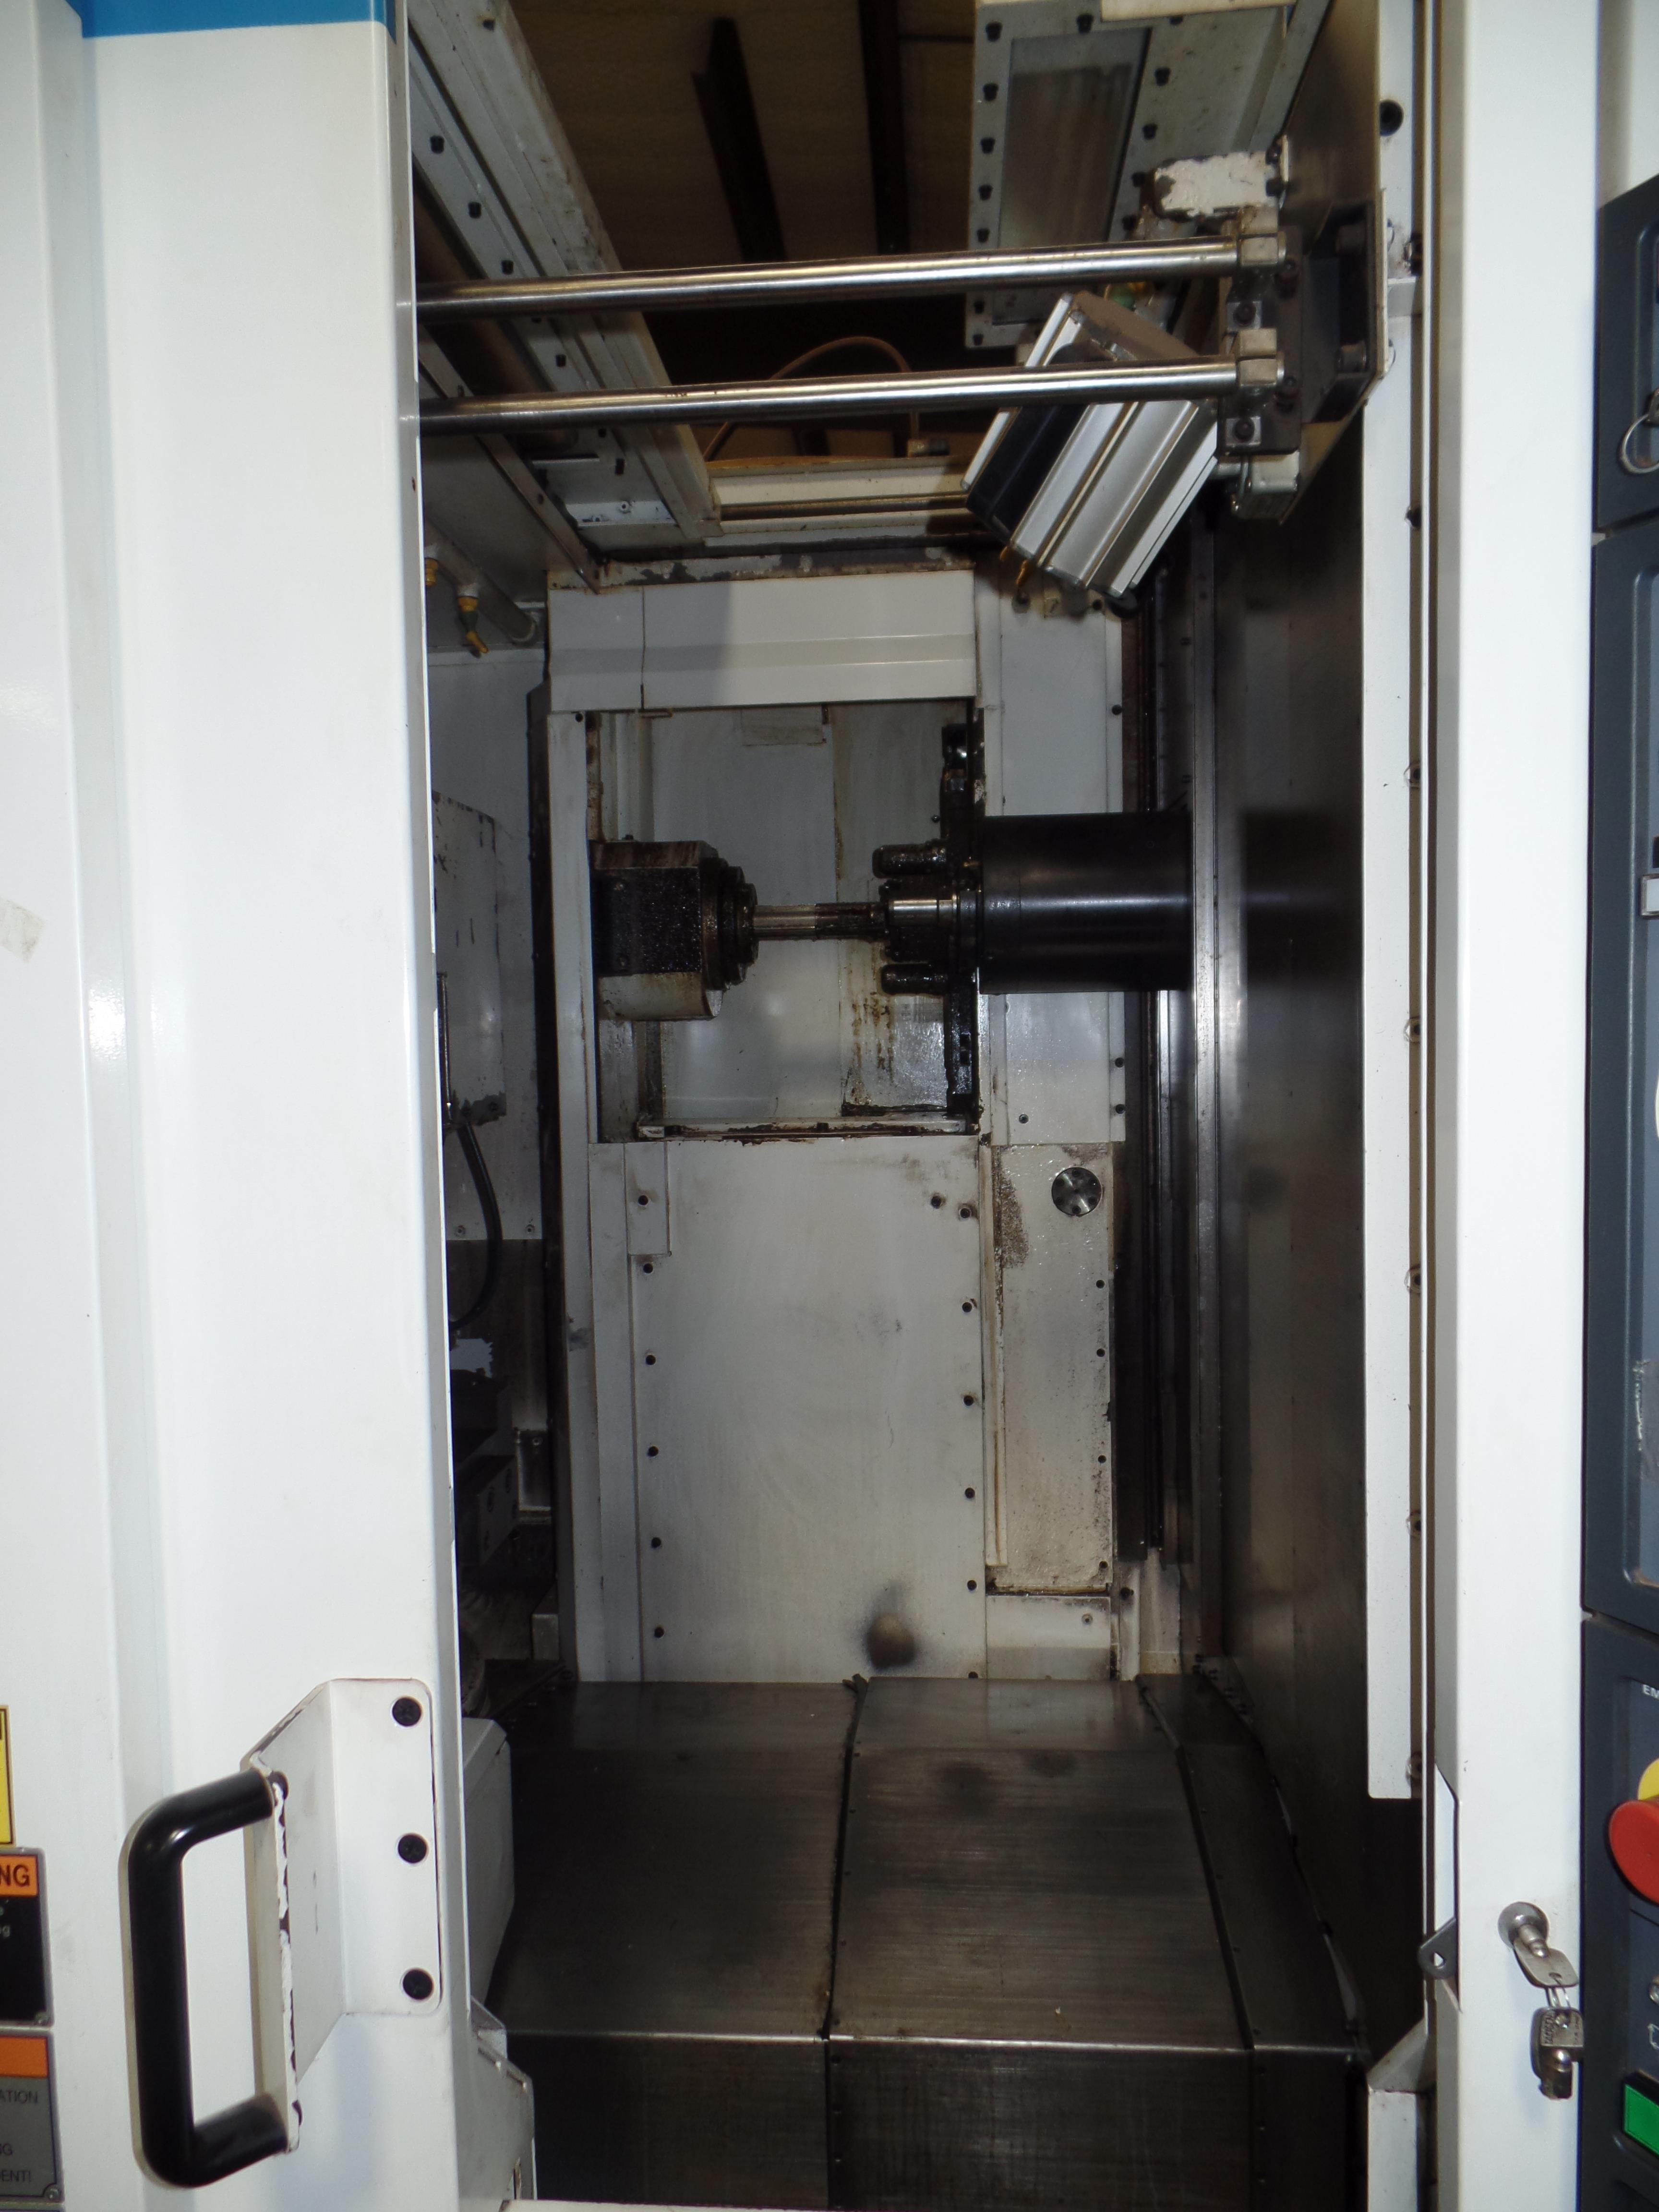 Lot 2 - 1998 Mori Seiki SH-500, Full 5-axis horizontal machining center, MSC-502 control, 10,000 rpm HSK